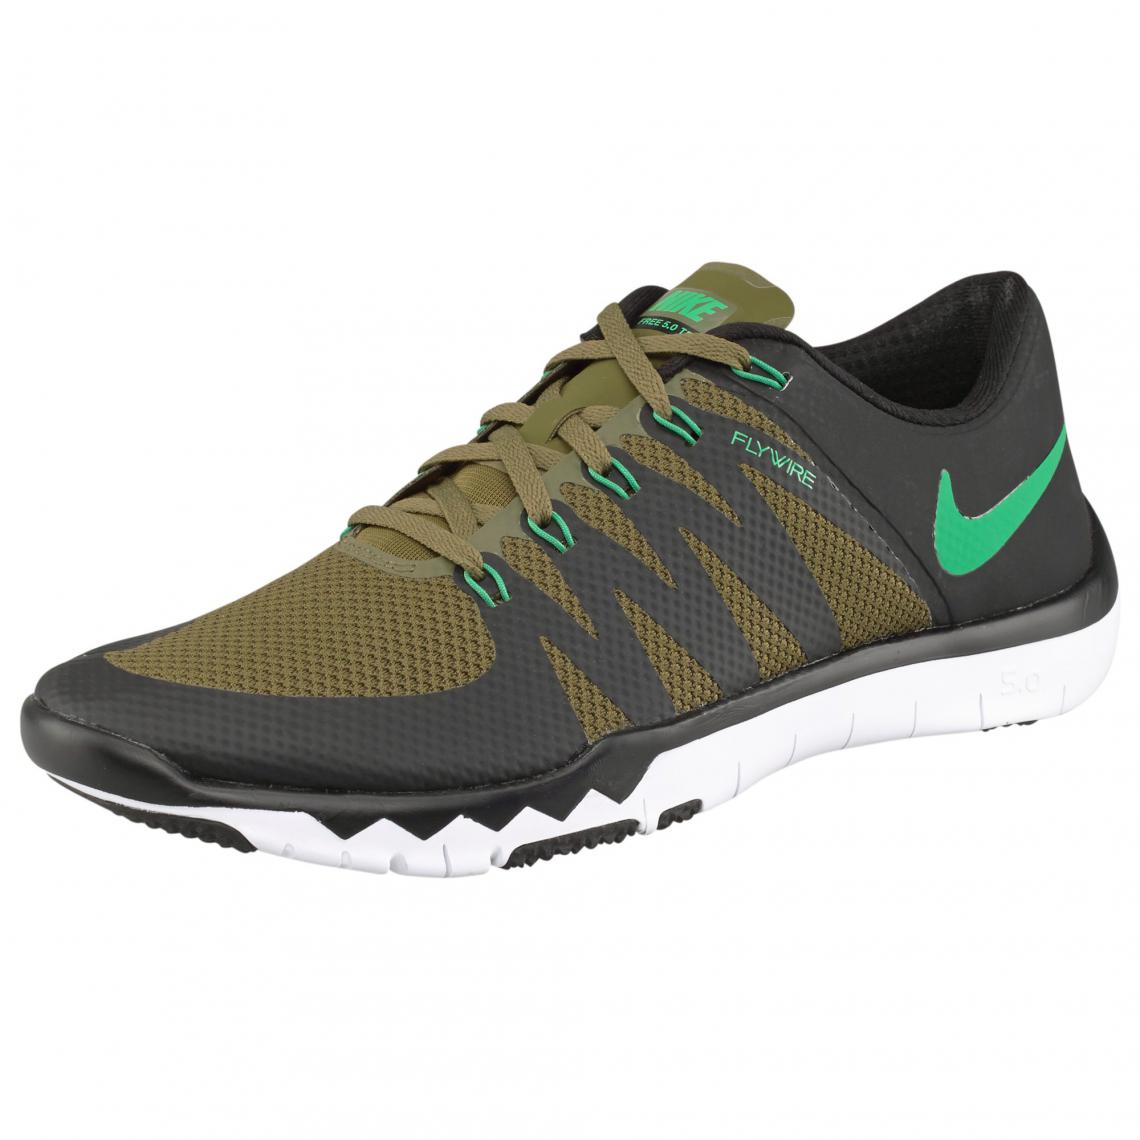 Nike Free Trainer 5.0 chaussures de training basses homme Noir | 3